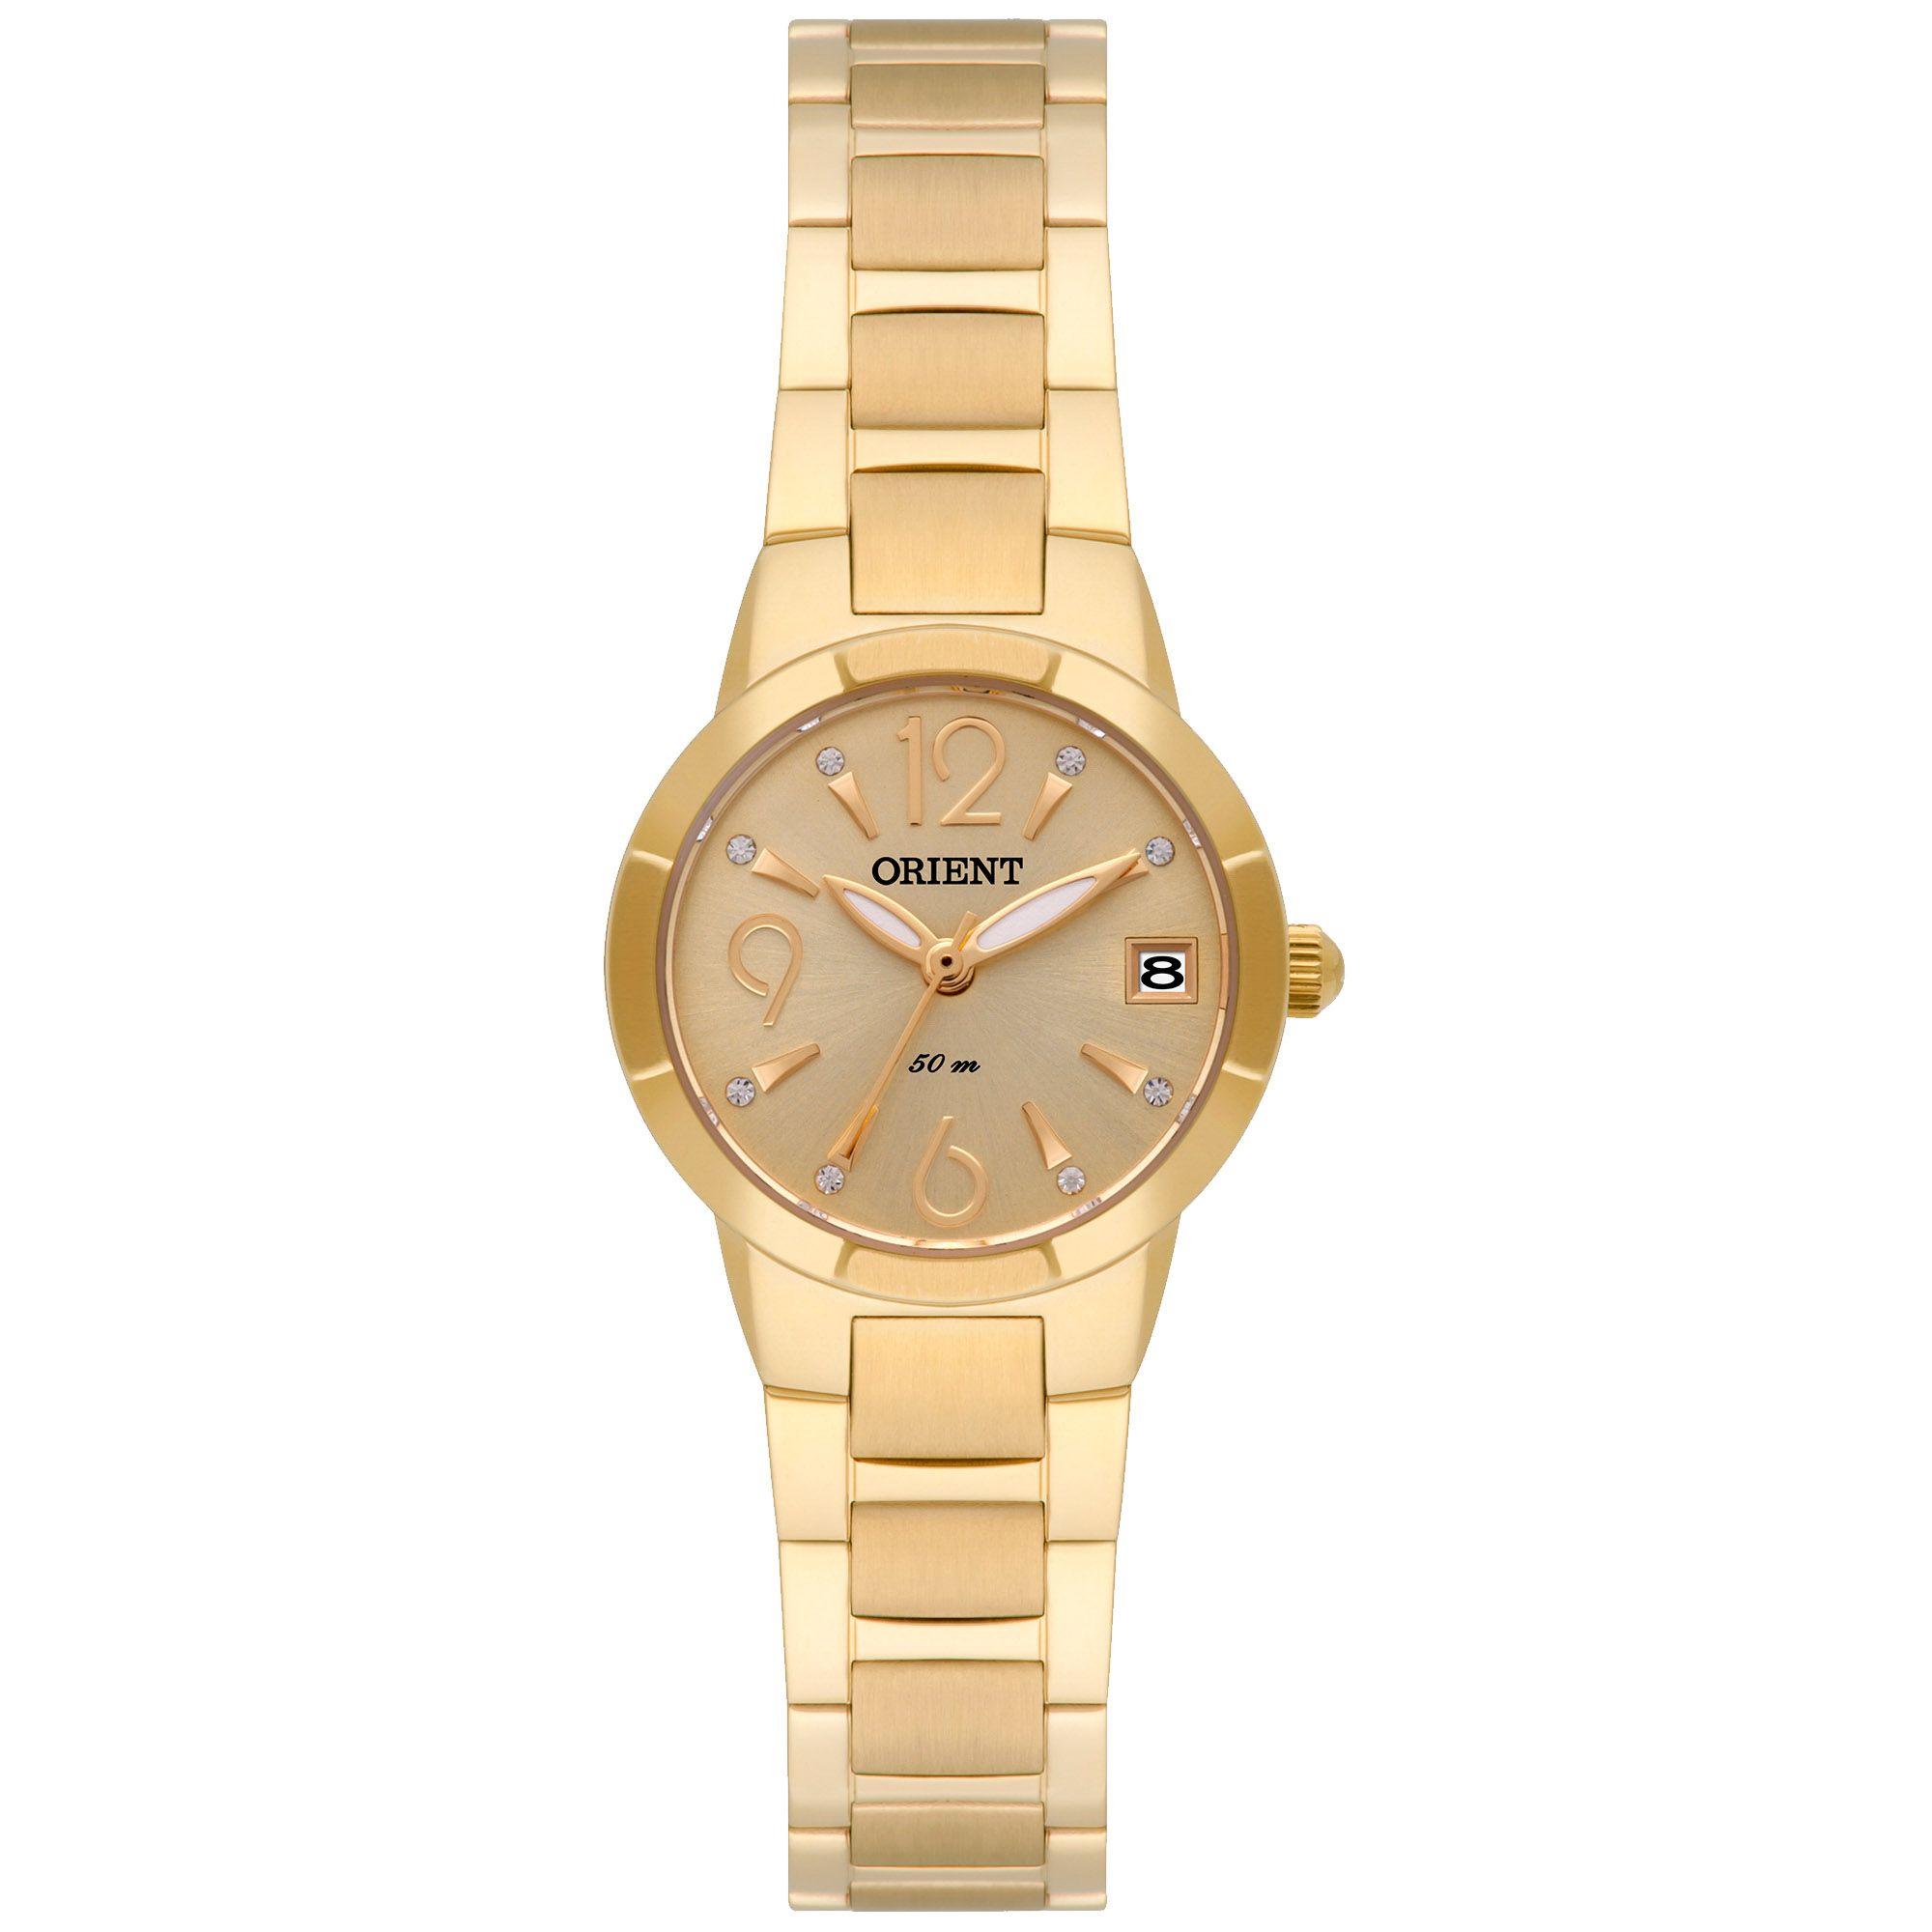 Relógio Feminino Orient FGSS1121 C2KX